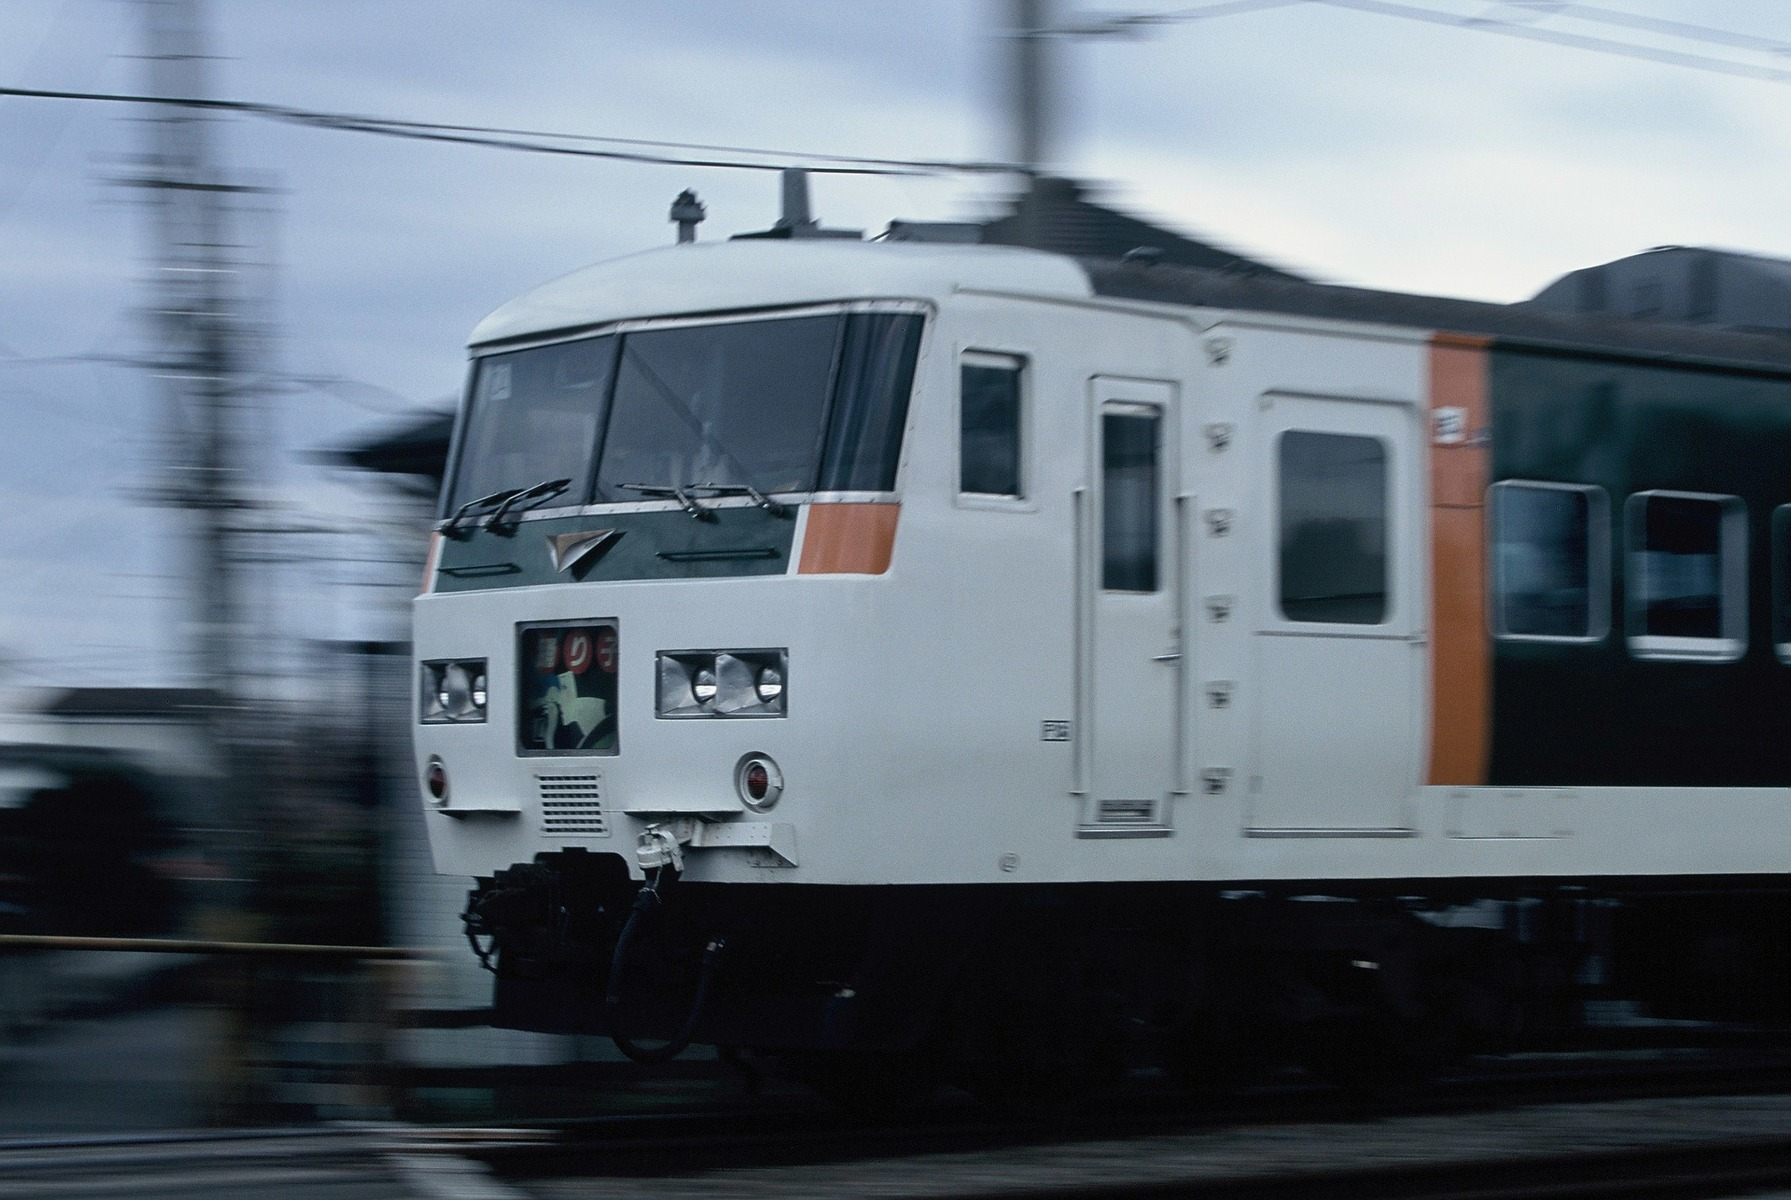 054-012